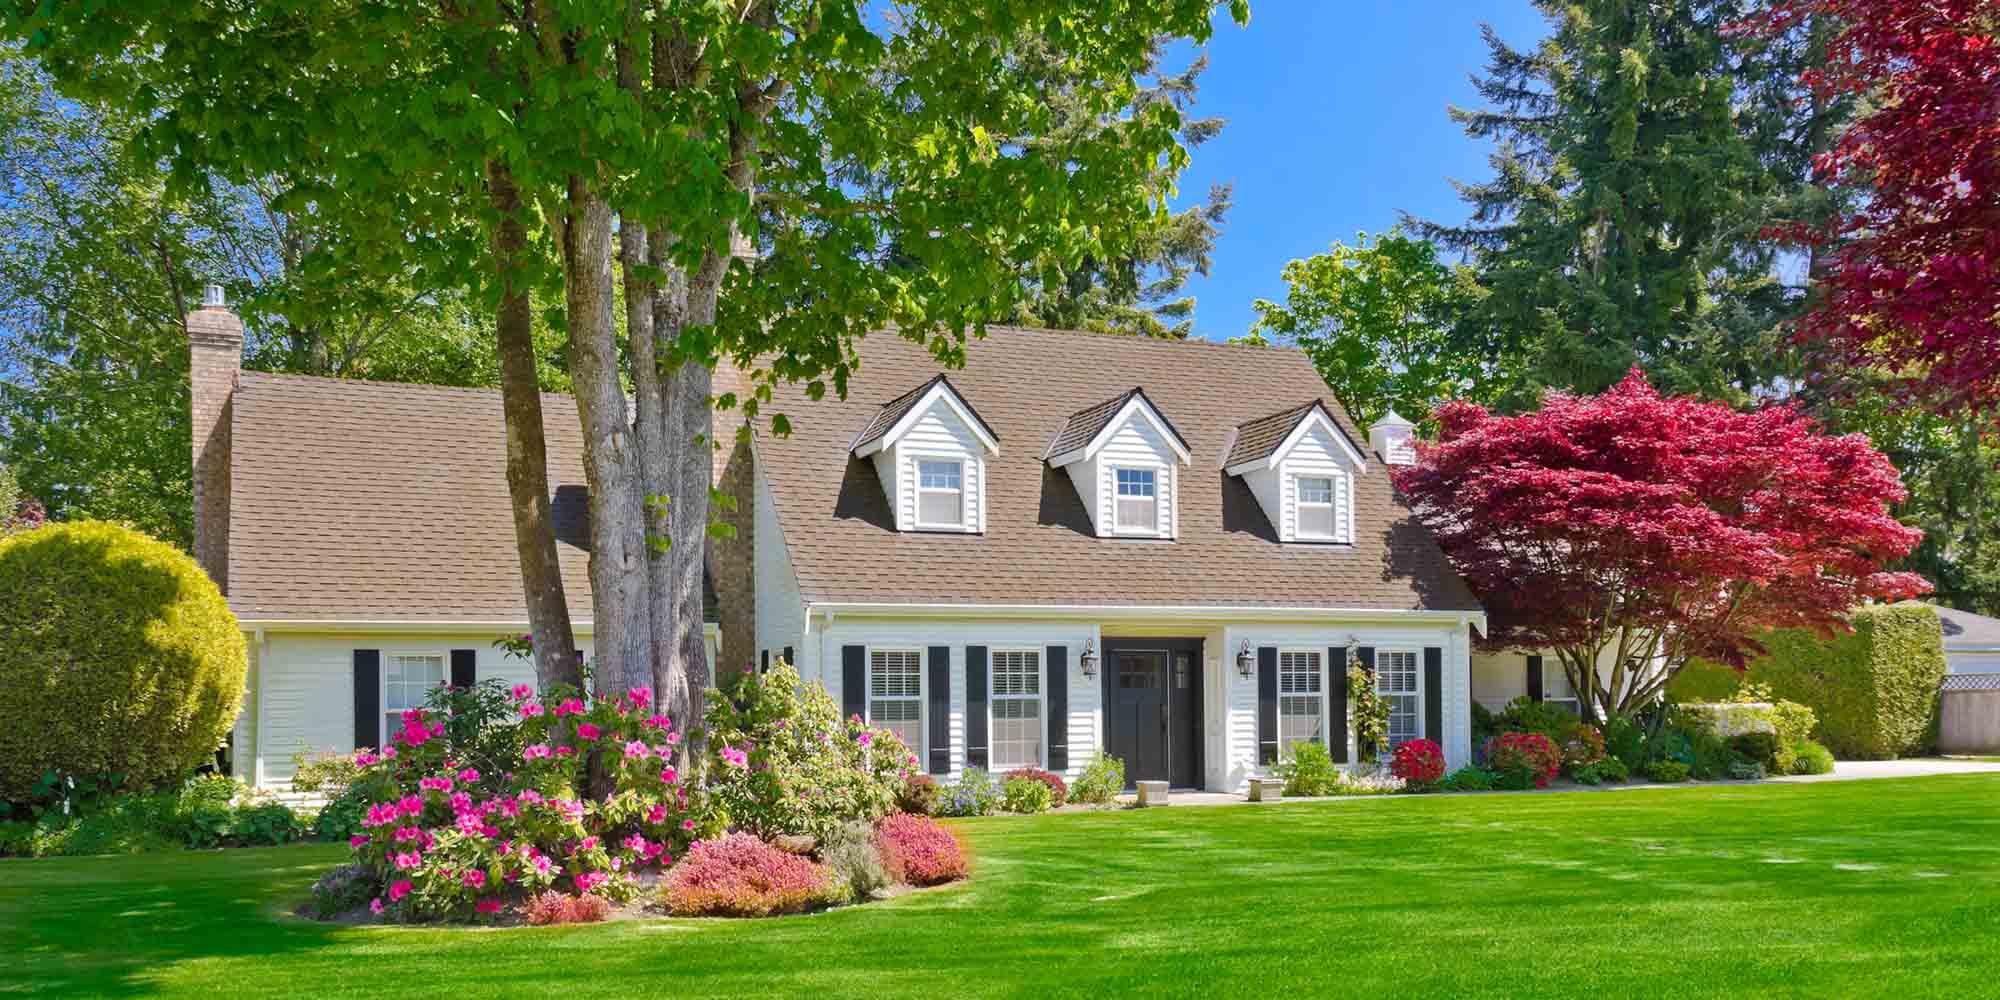 Glen Rock Dream Homes Bergen County Real Estate